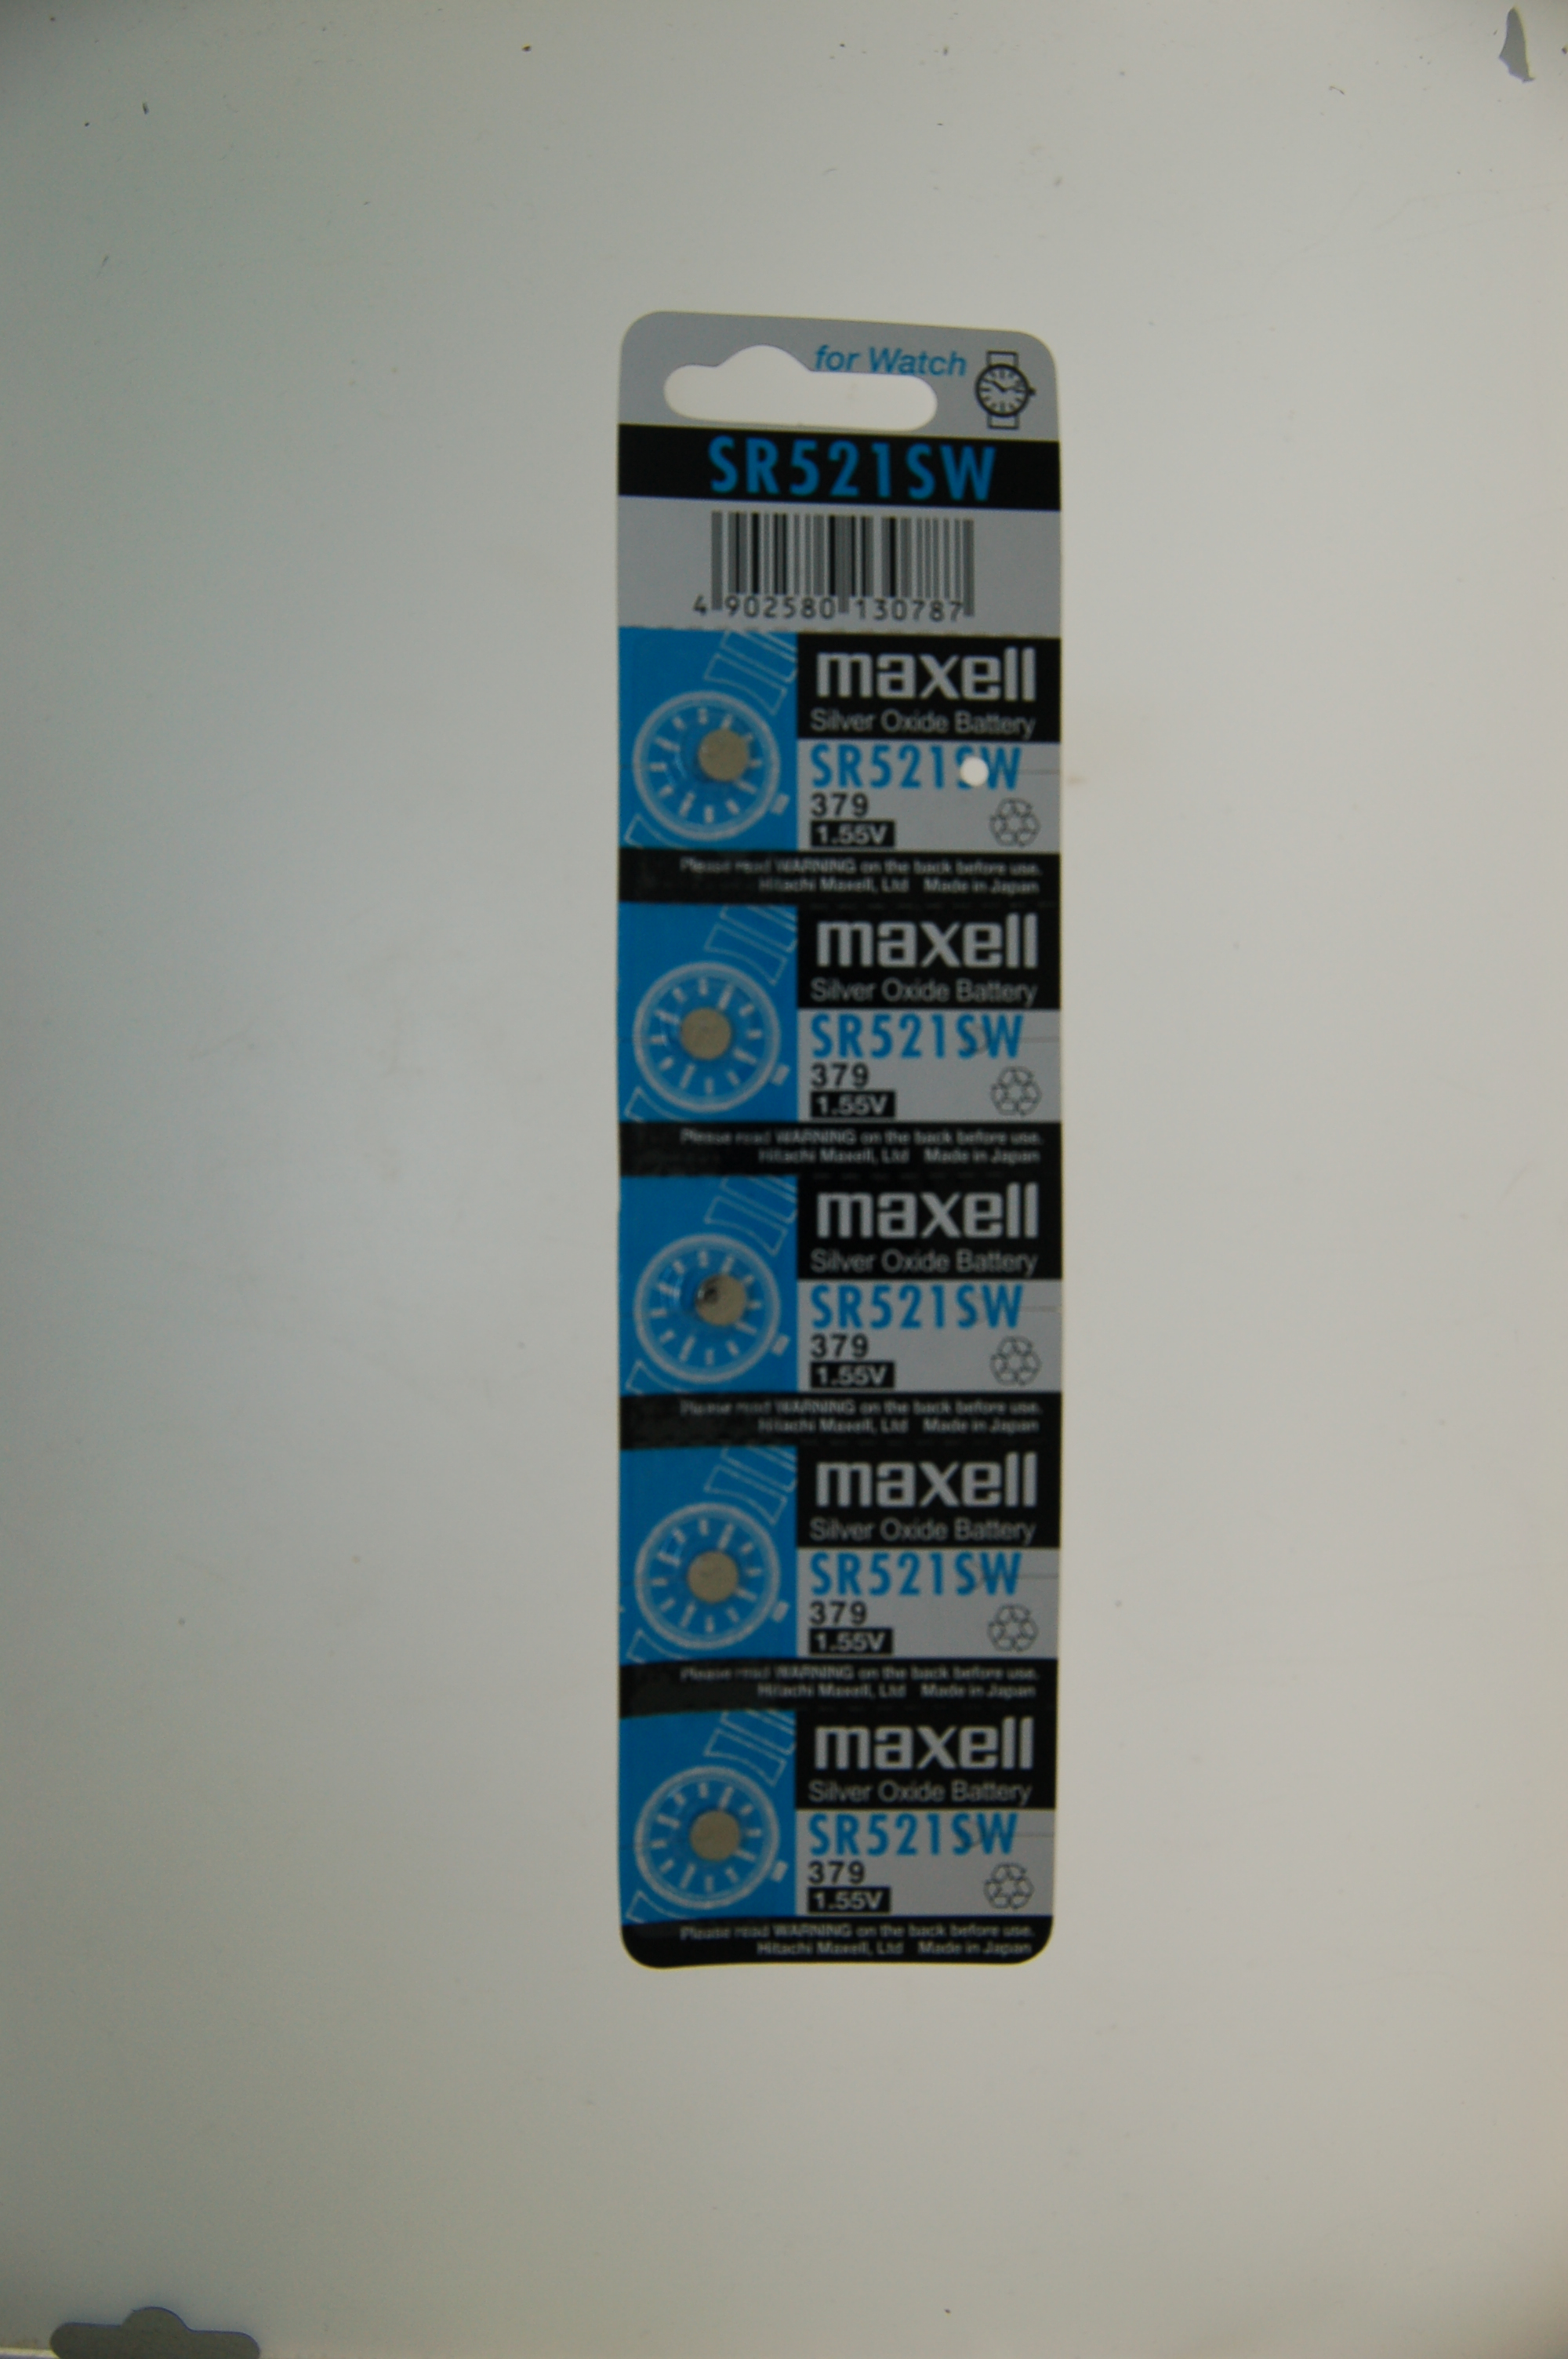 Maxell Silver Oxide Battery SR521SW